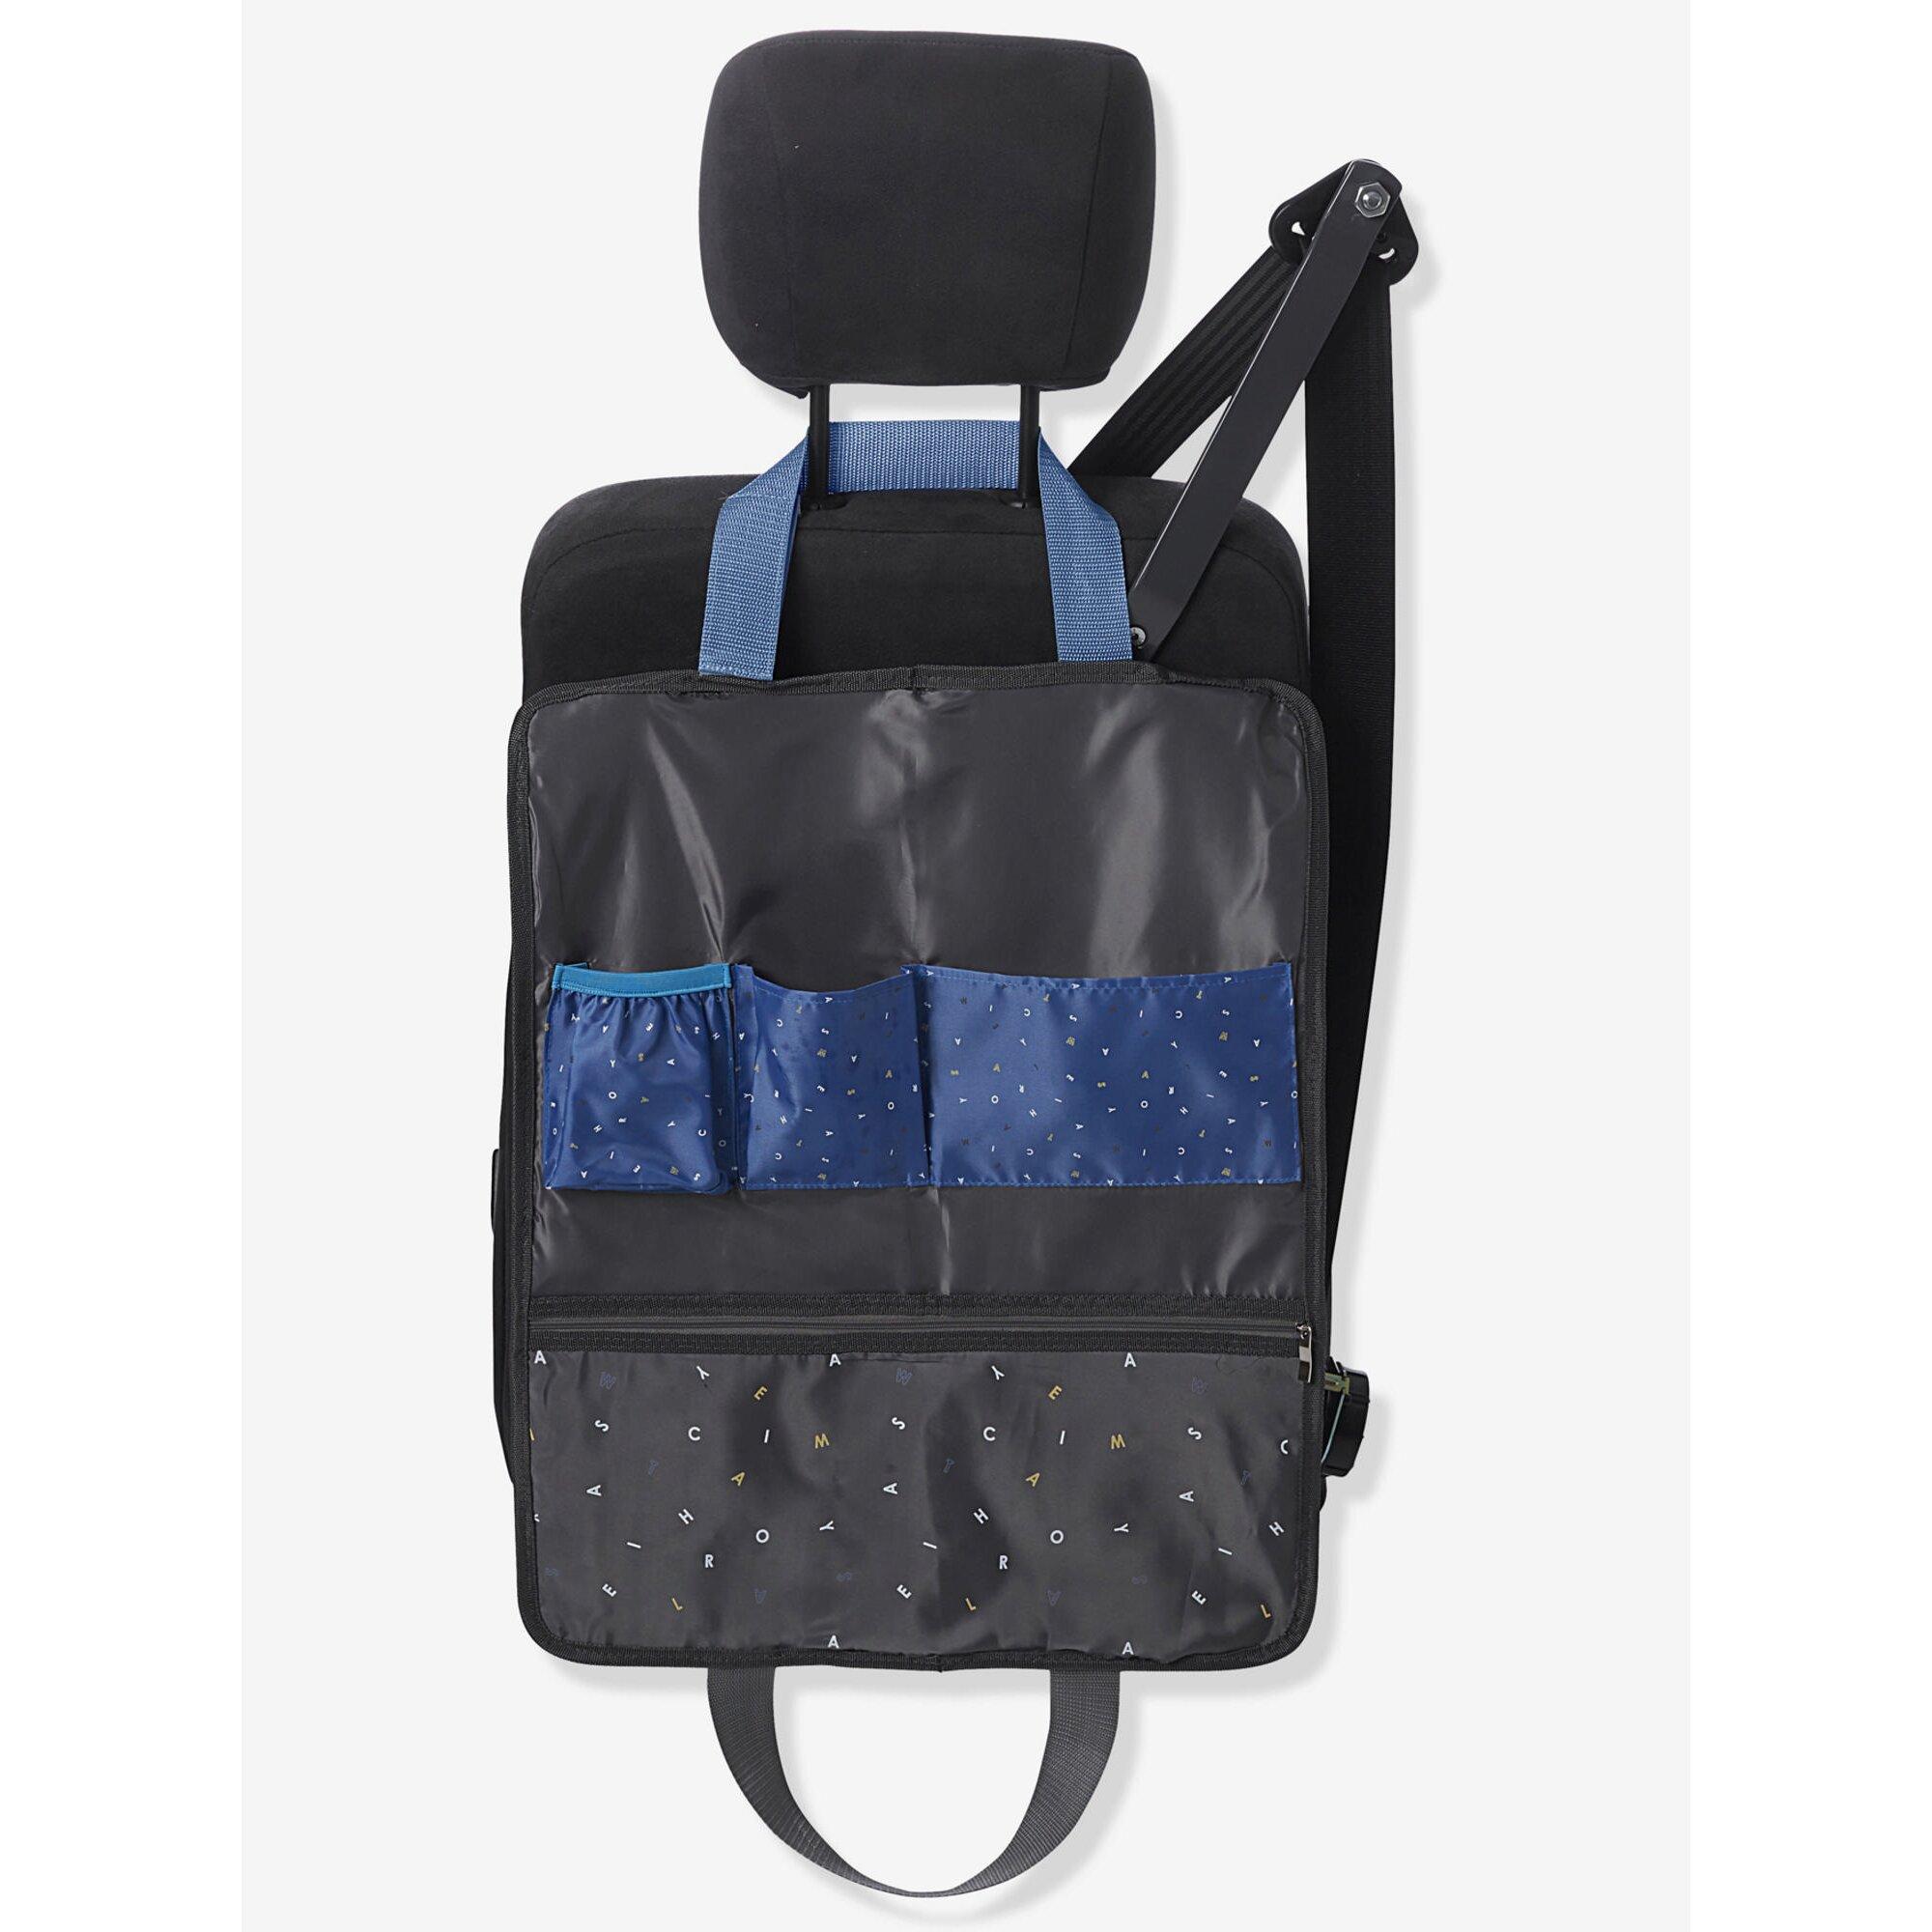 vertbaudet-auto-rucksitztasche-fur-kinder-blau, 14.99 EUR @ babywalz-de